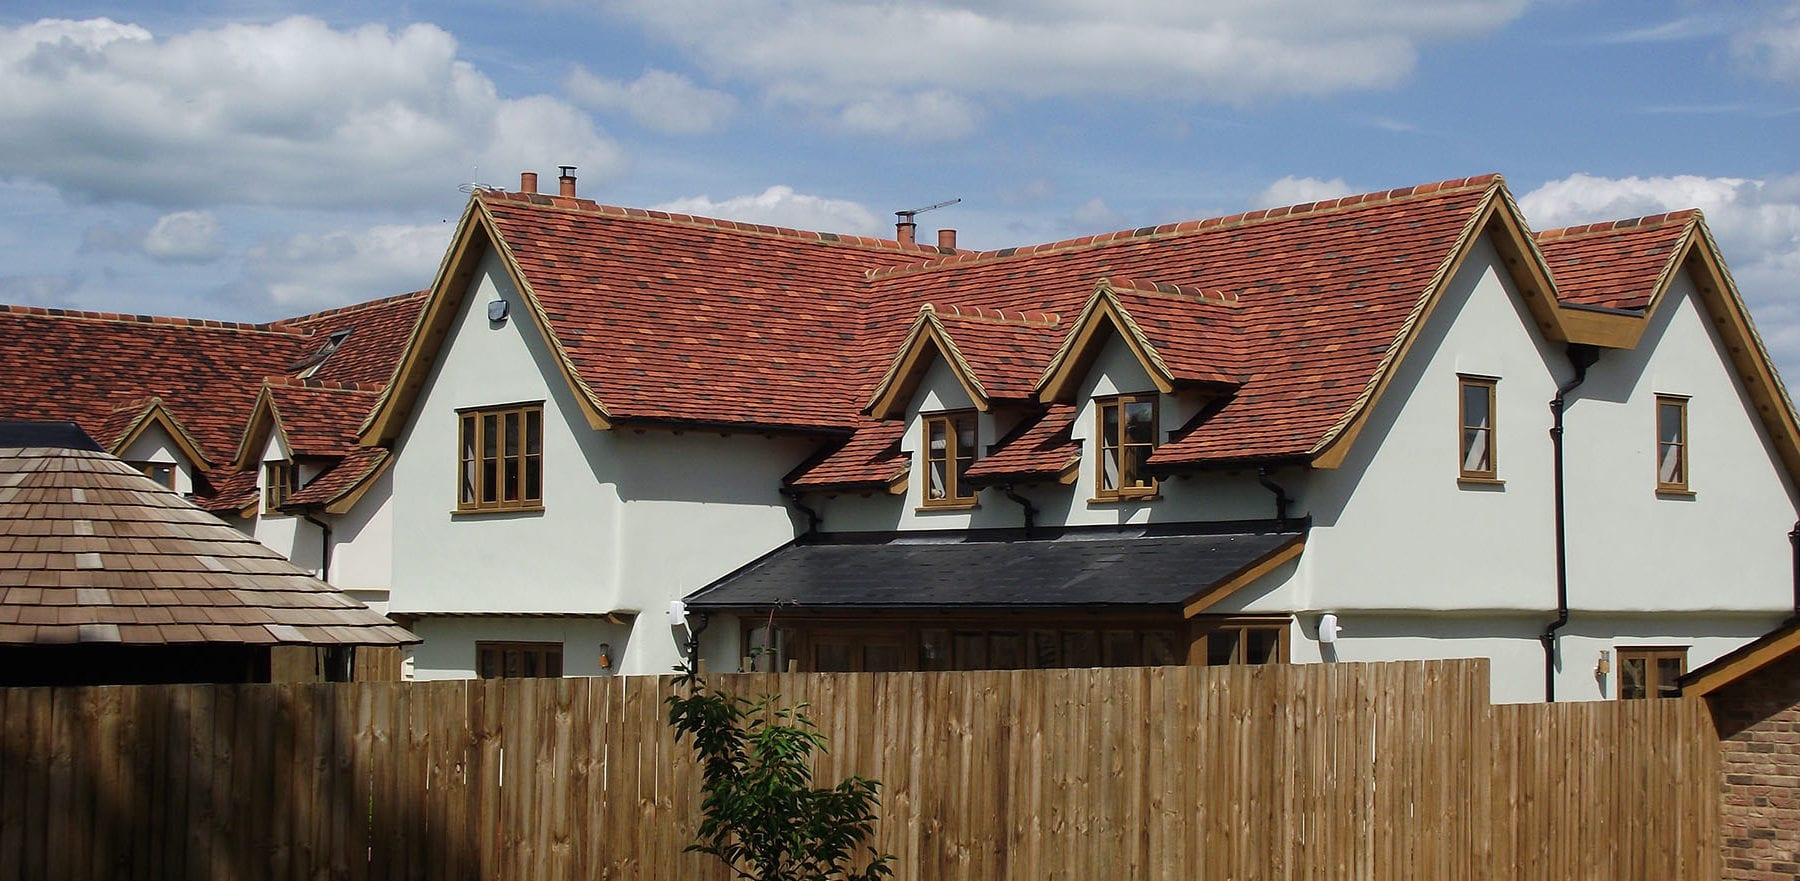 Lifestiles - Handmade Multi Clay Roof Tiles - Manuden, England 3